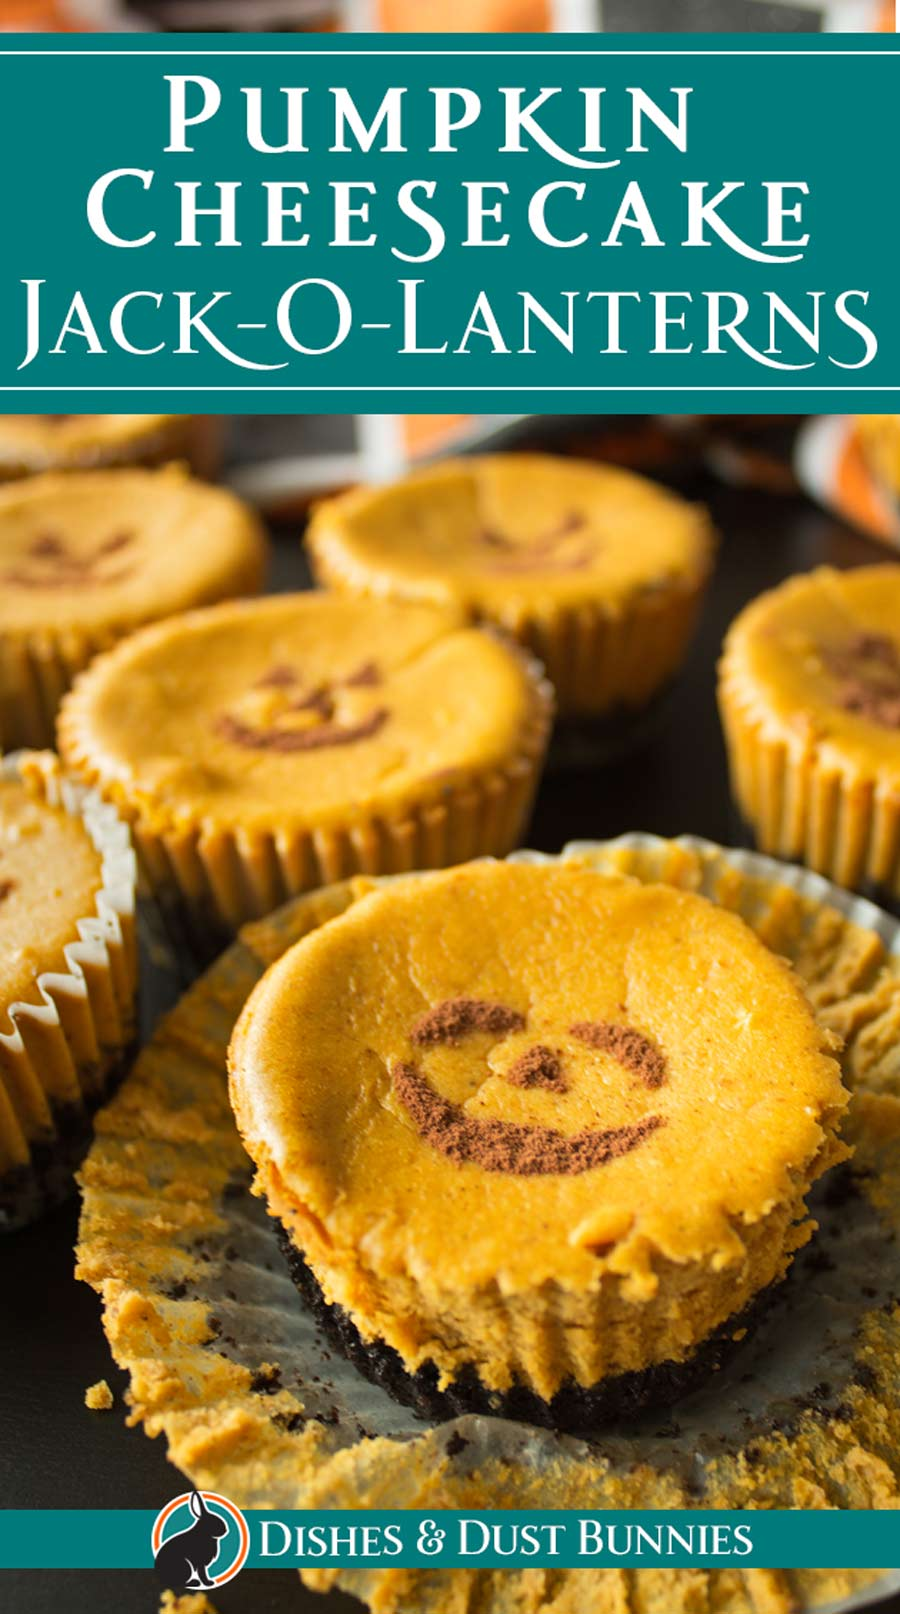 Pumpkin Cheesecake Jack-O-Lanterns via @mvdustbunnies